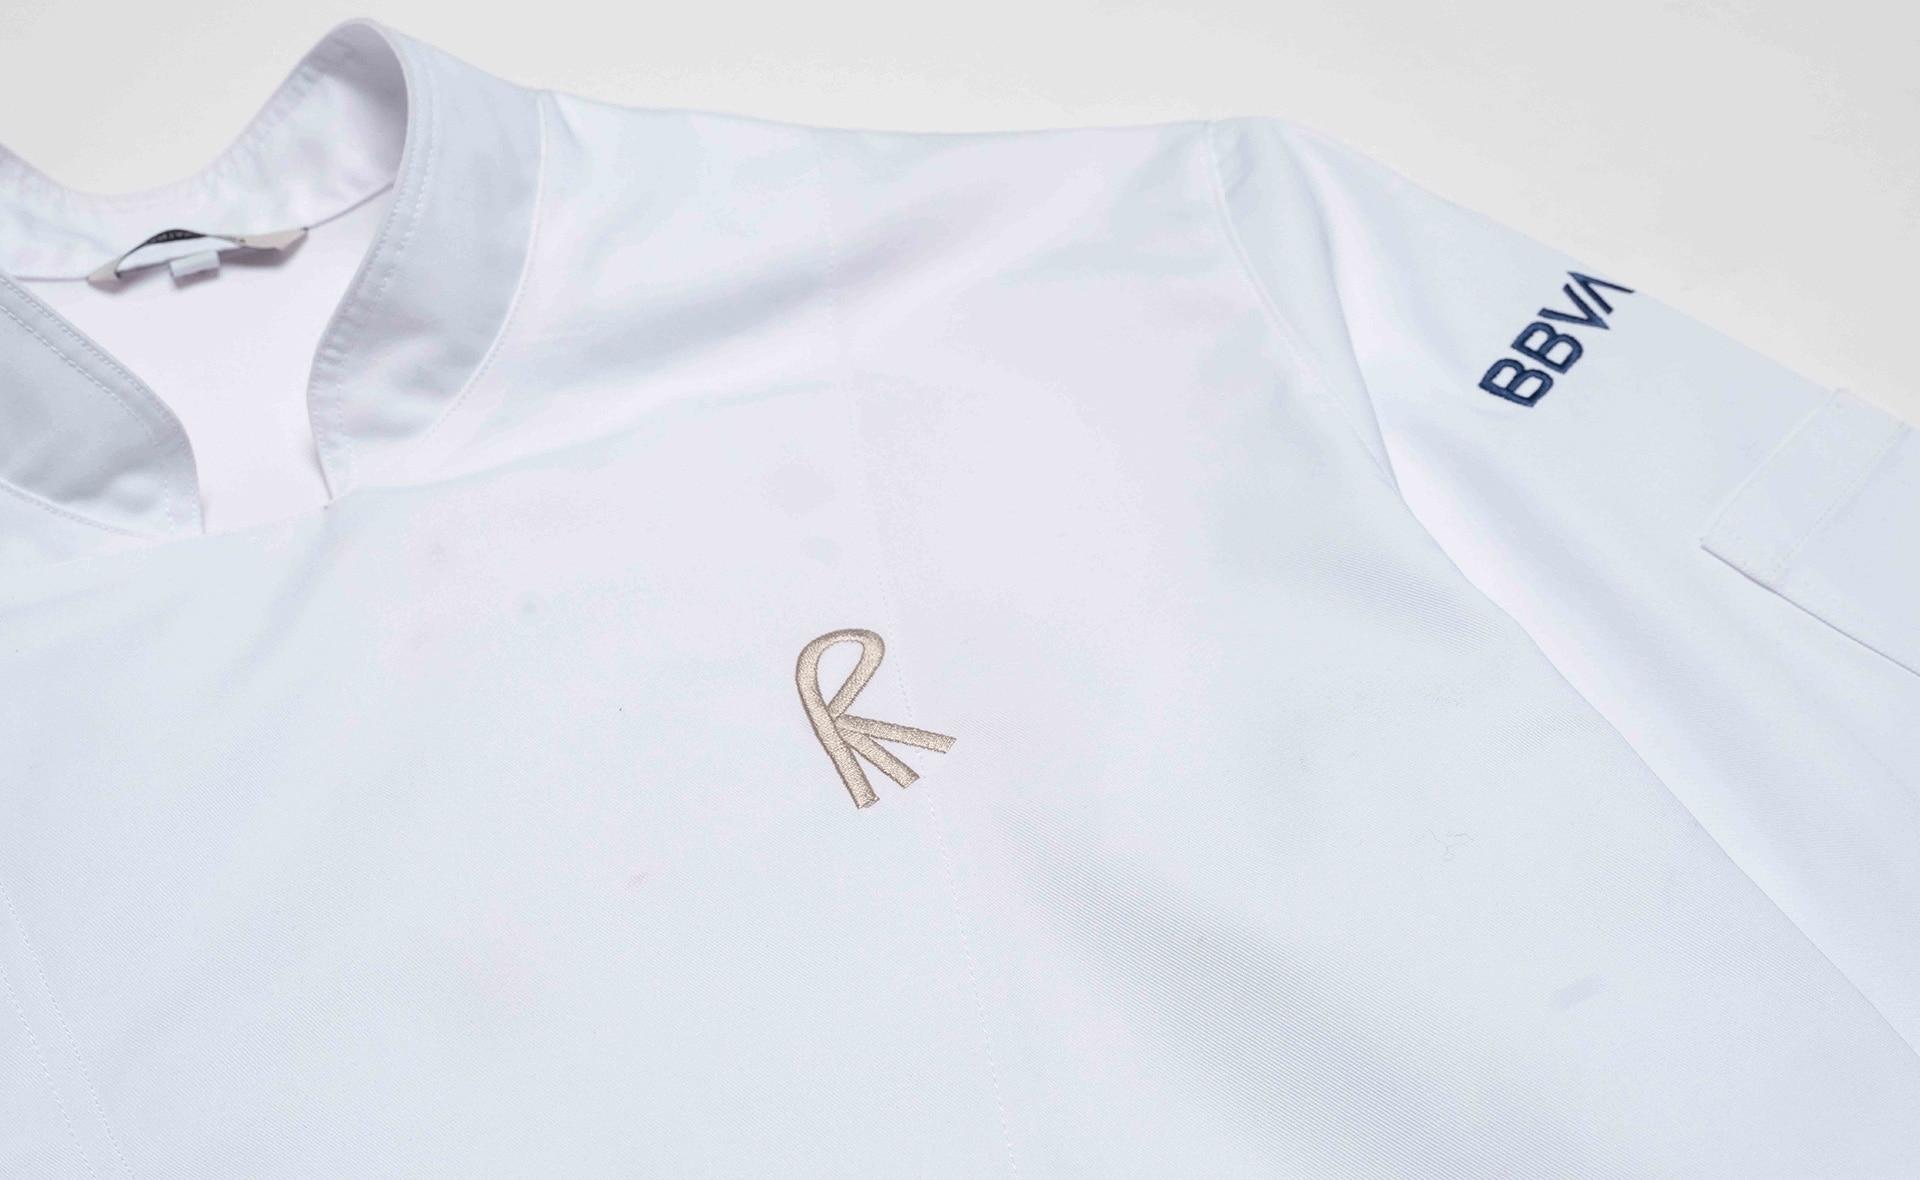 BBVA-Ropa-Recicla-v2-BBVA-Ropa-Recicla-uniforme-Celler-prendas-sostenibles